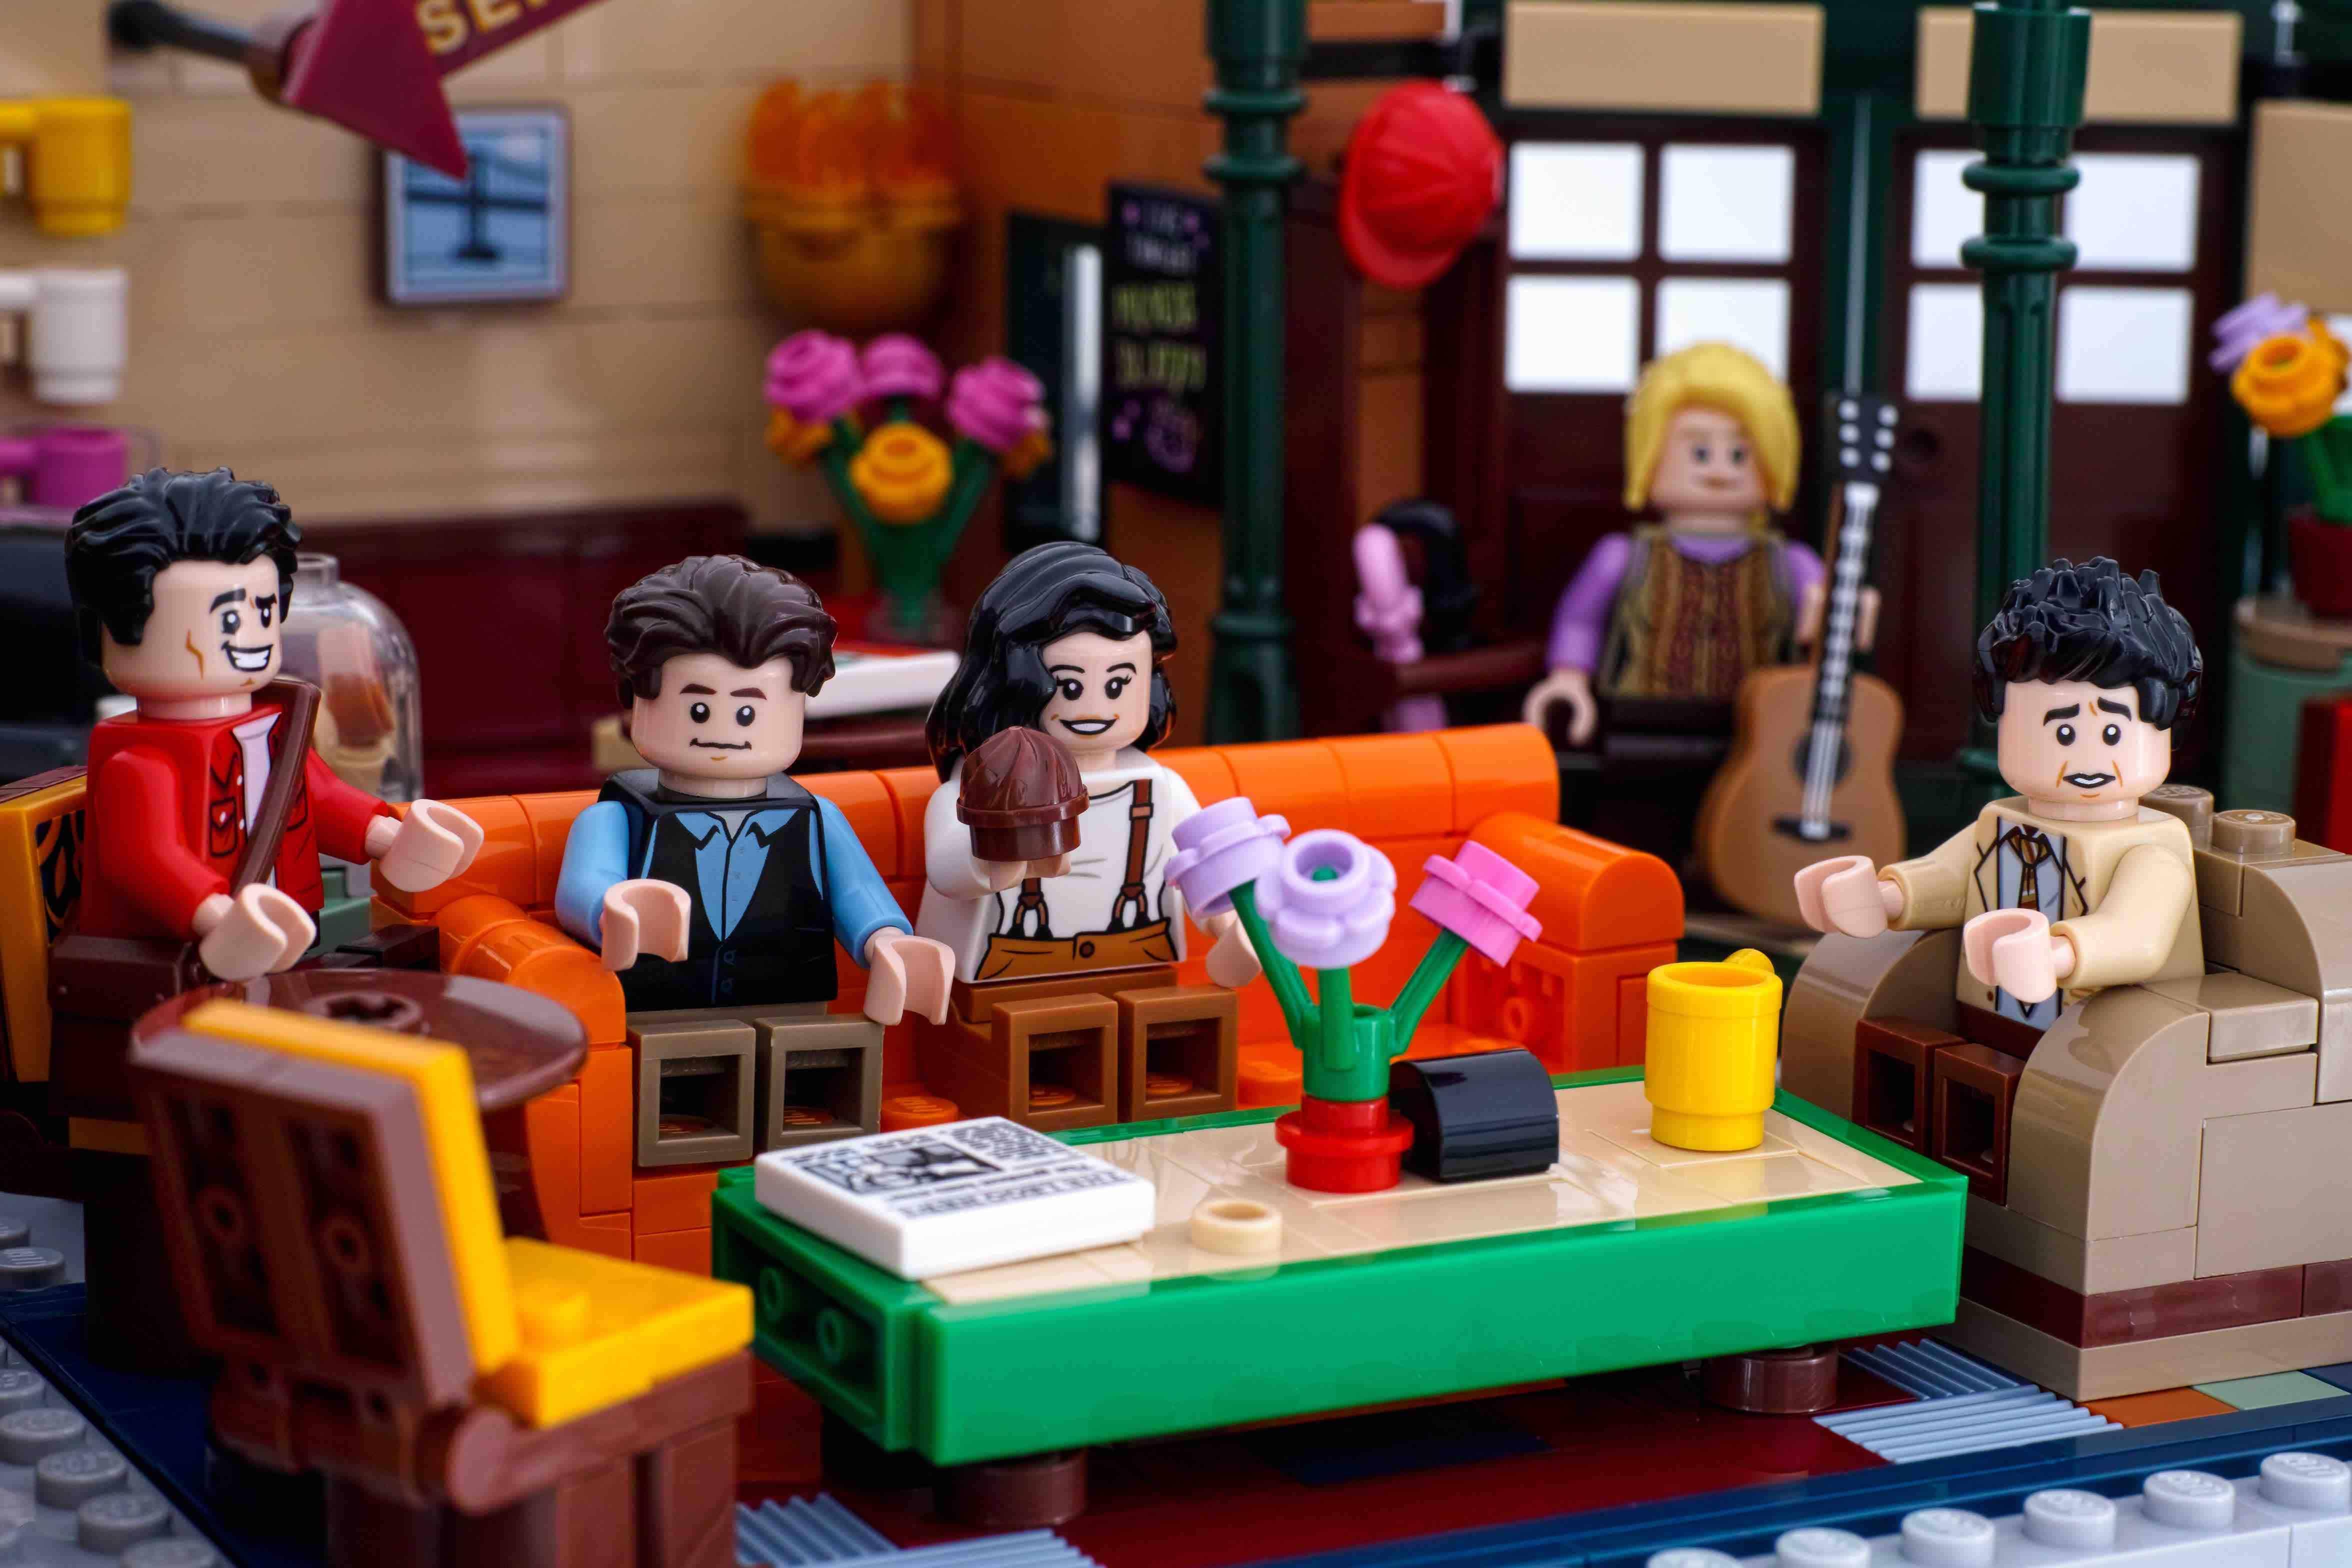 Lego model of Friends, Friends facts